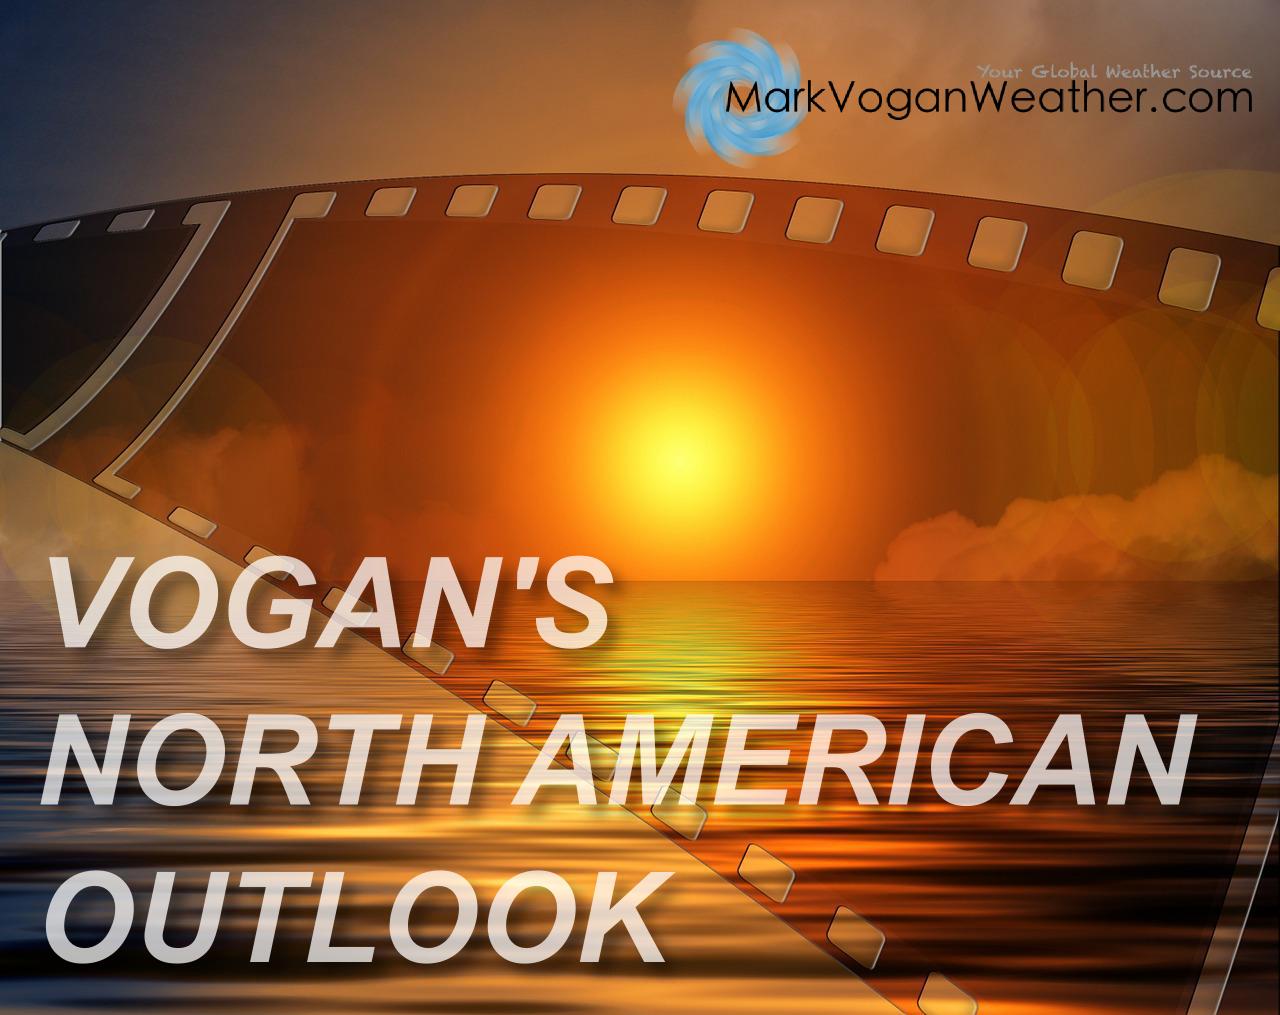 SUN 26 OCT: VOGAN'S NORTH AMERICAN OUTLOOK